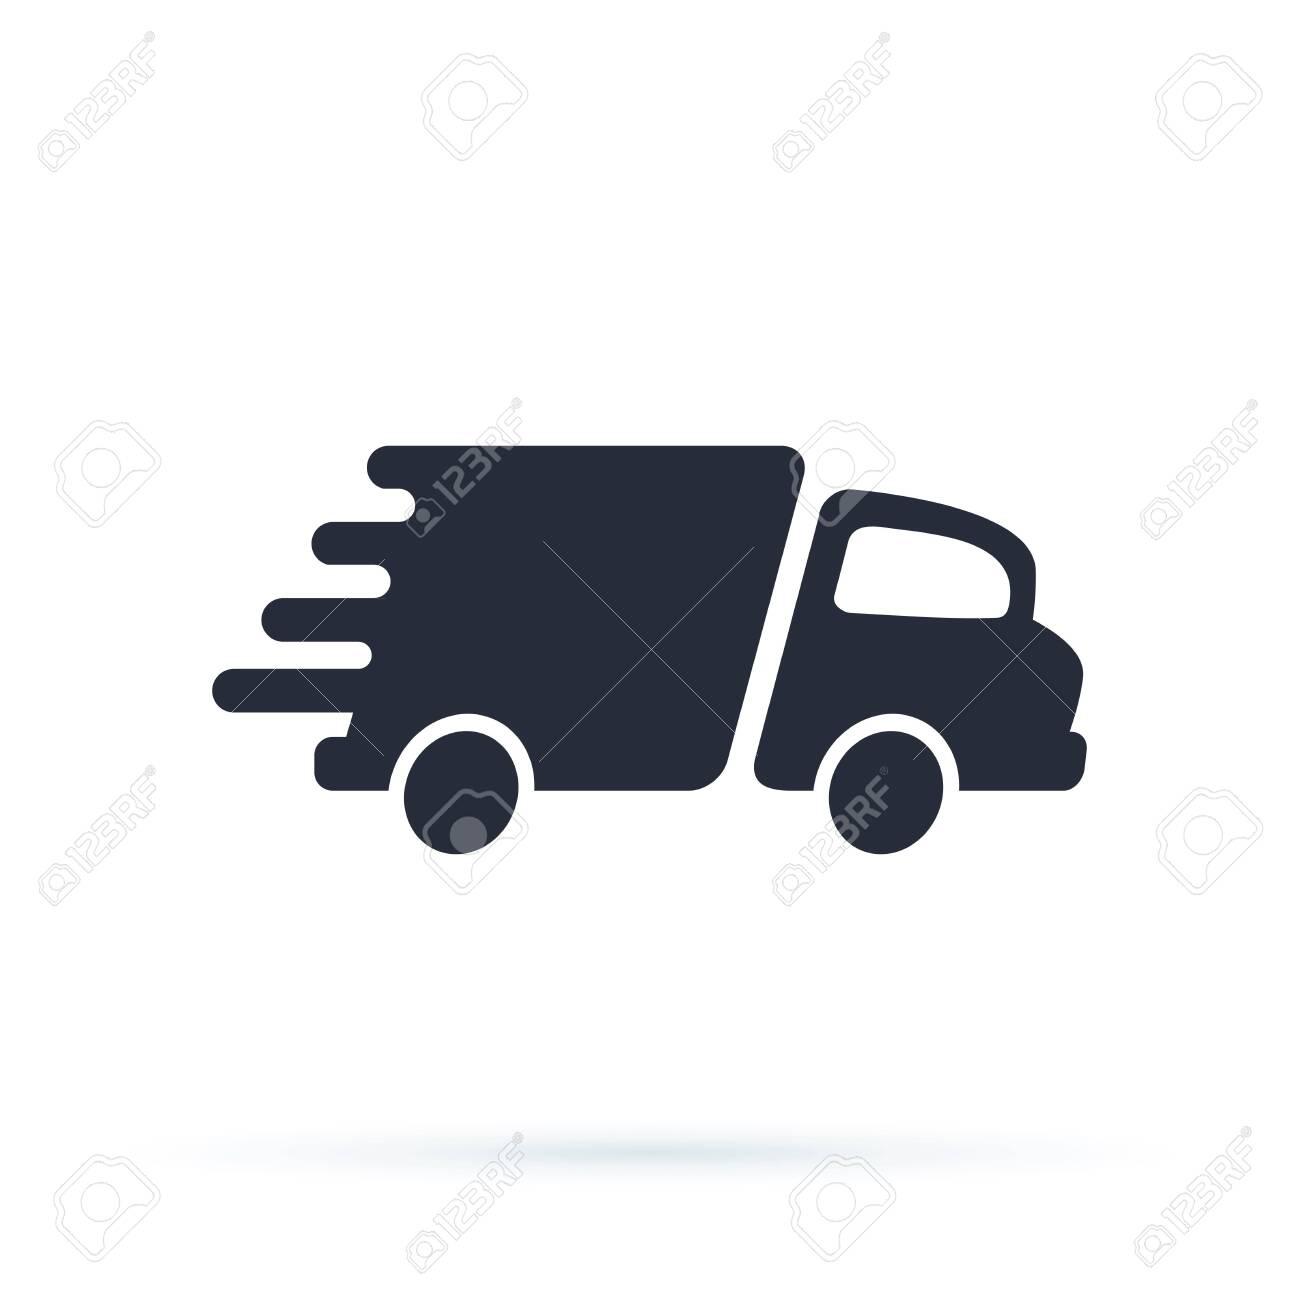 Delivery Truck Icon Vector Design Logo Template - 121663449